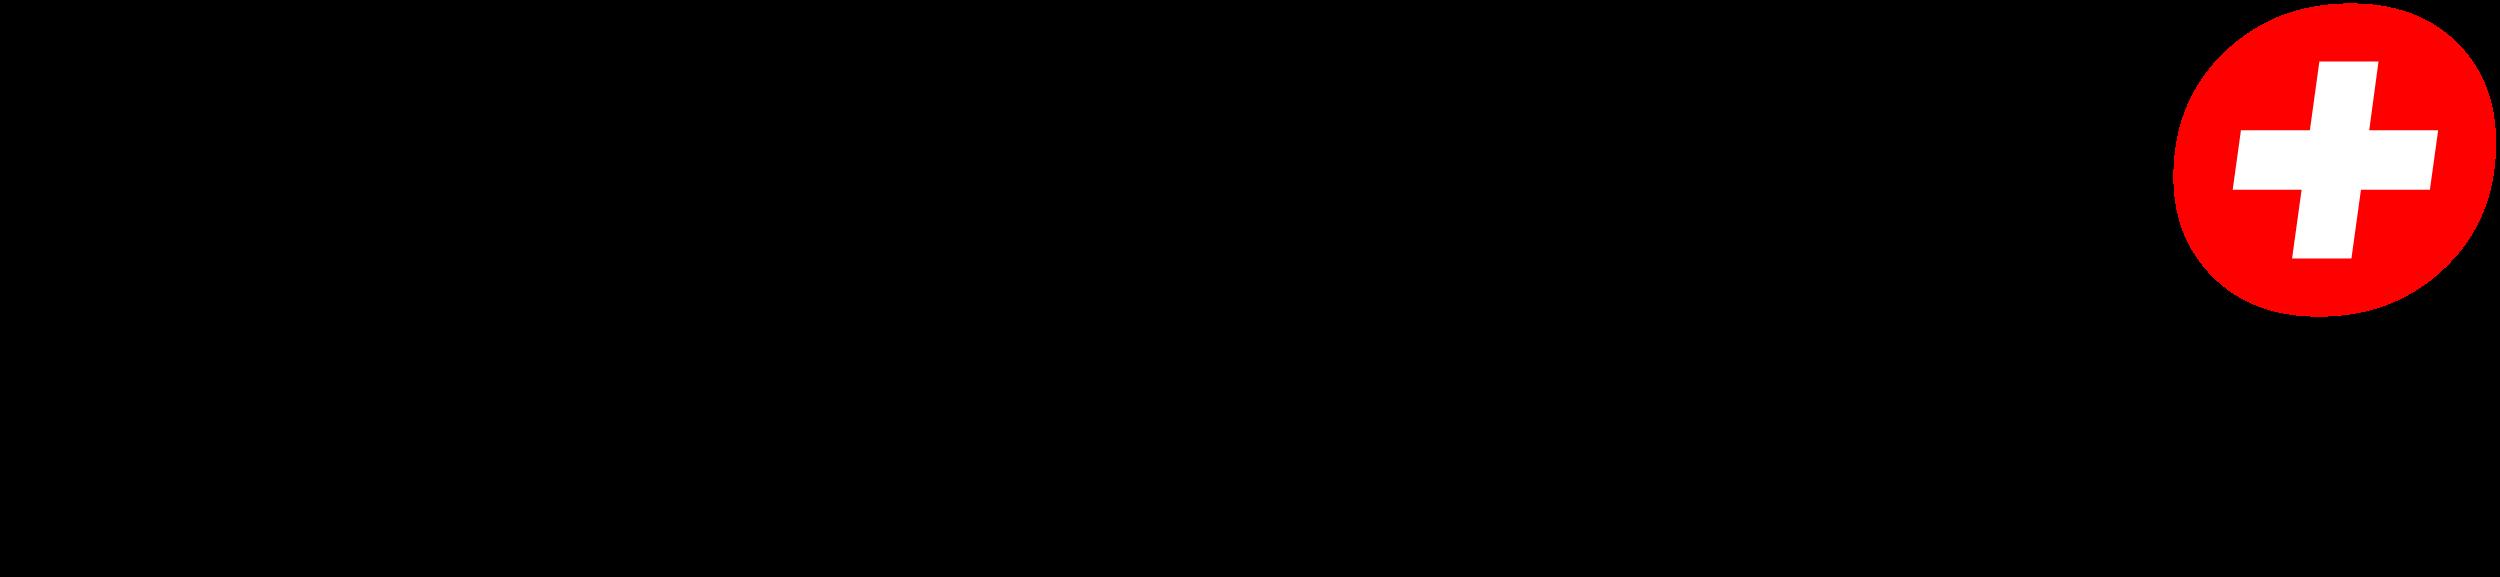 Logo of swicos